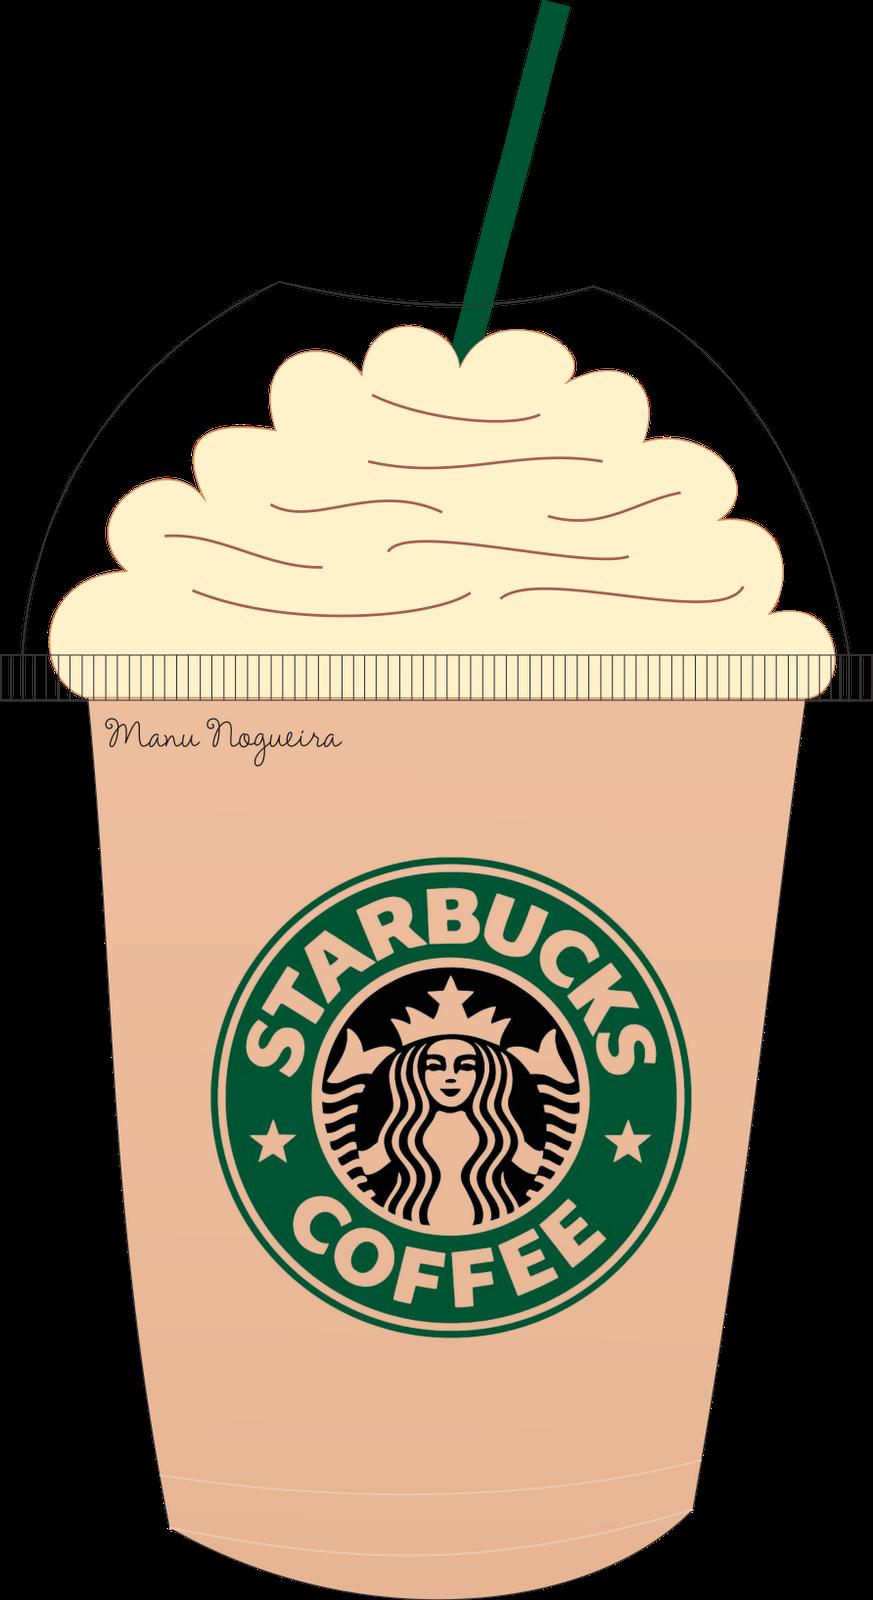 Starbucks Drink Transparent Tumblr | www.imgkid.com - The ...